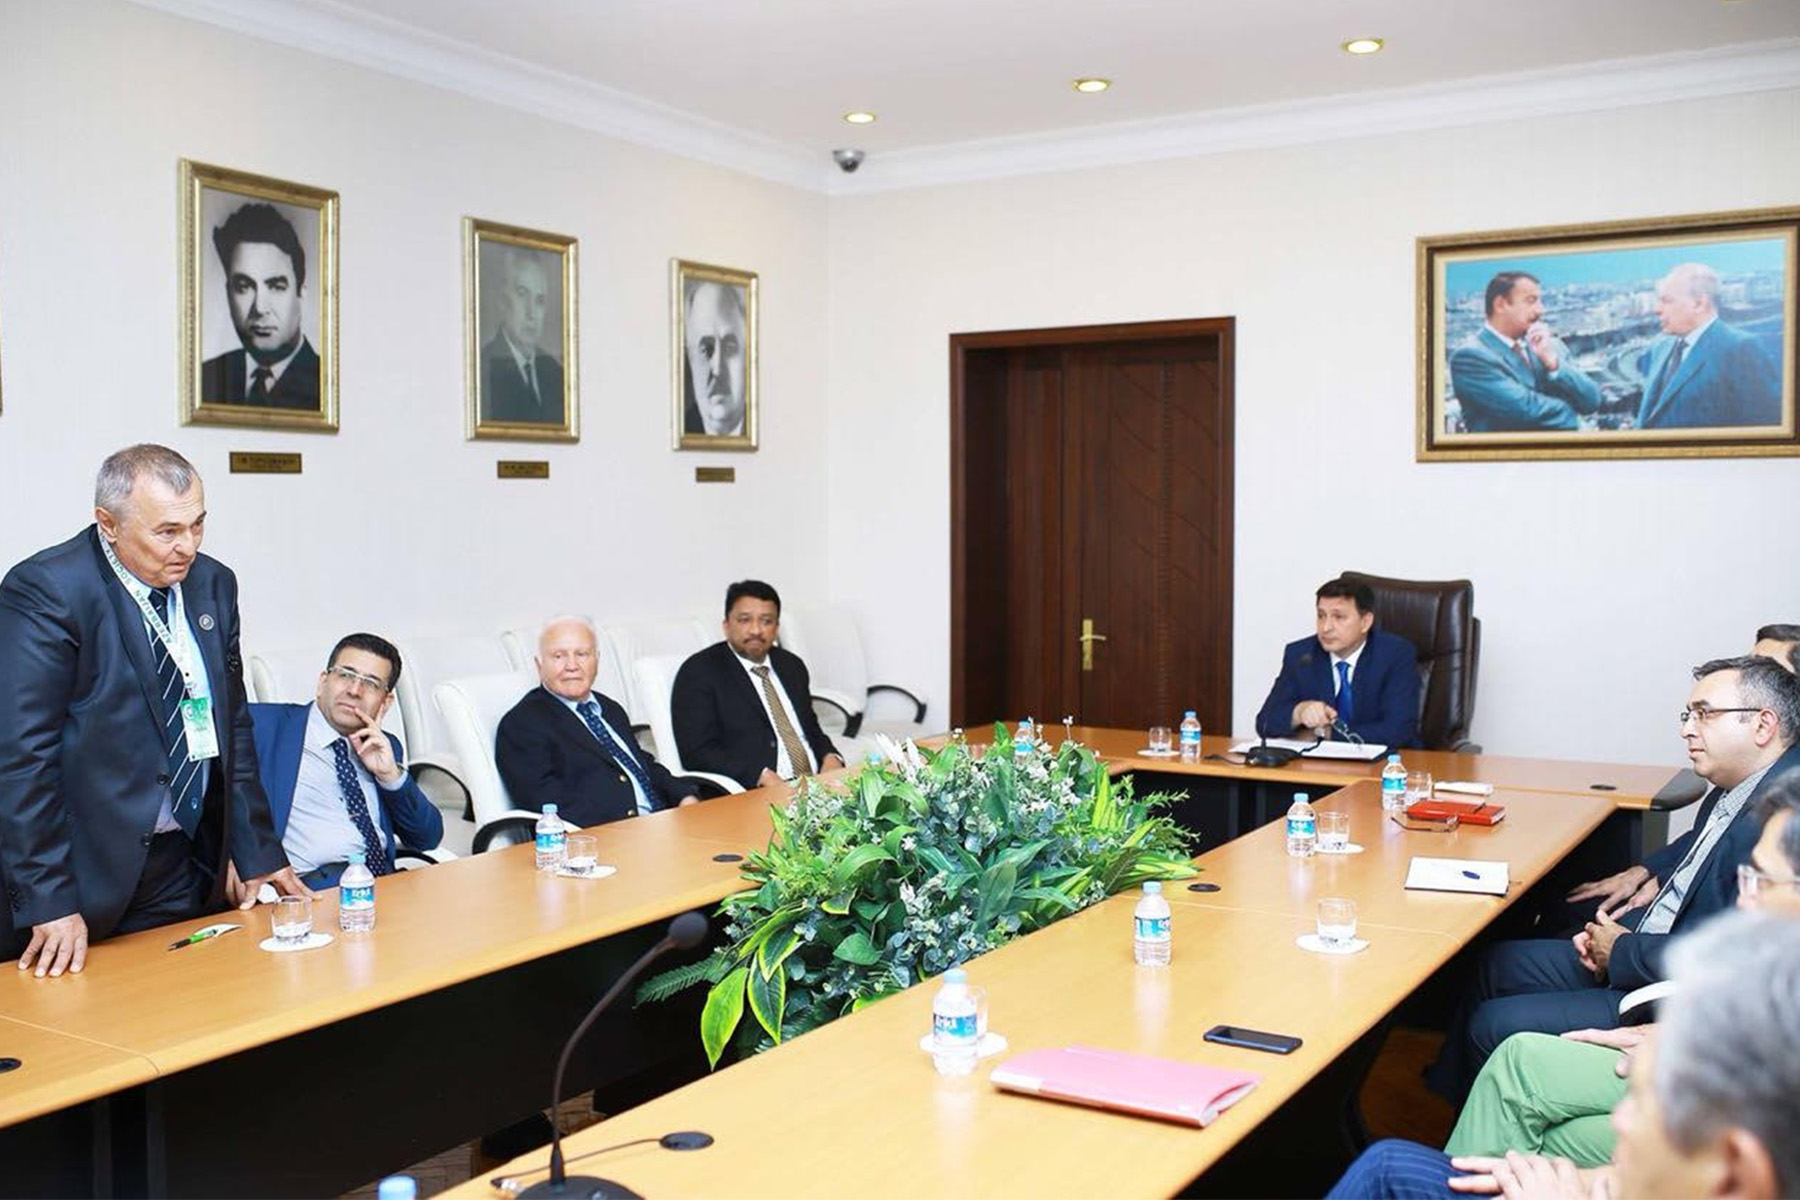 Dr SM Balaji during his meeting with the Rector of Azerbaycan Tibb Universiteti, His Excellency Dr Garay Chingiz Garaybayli